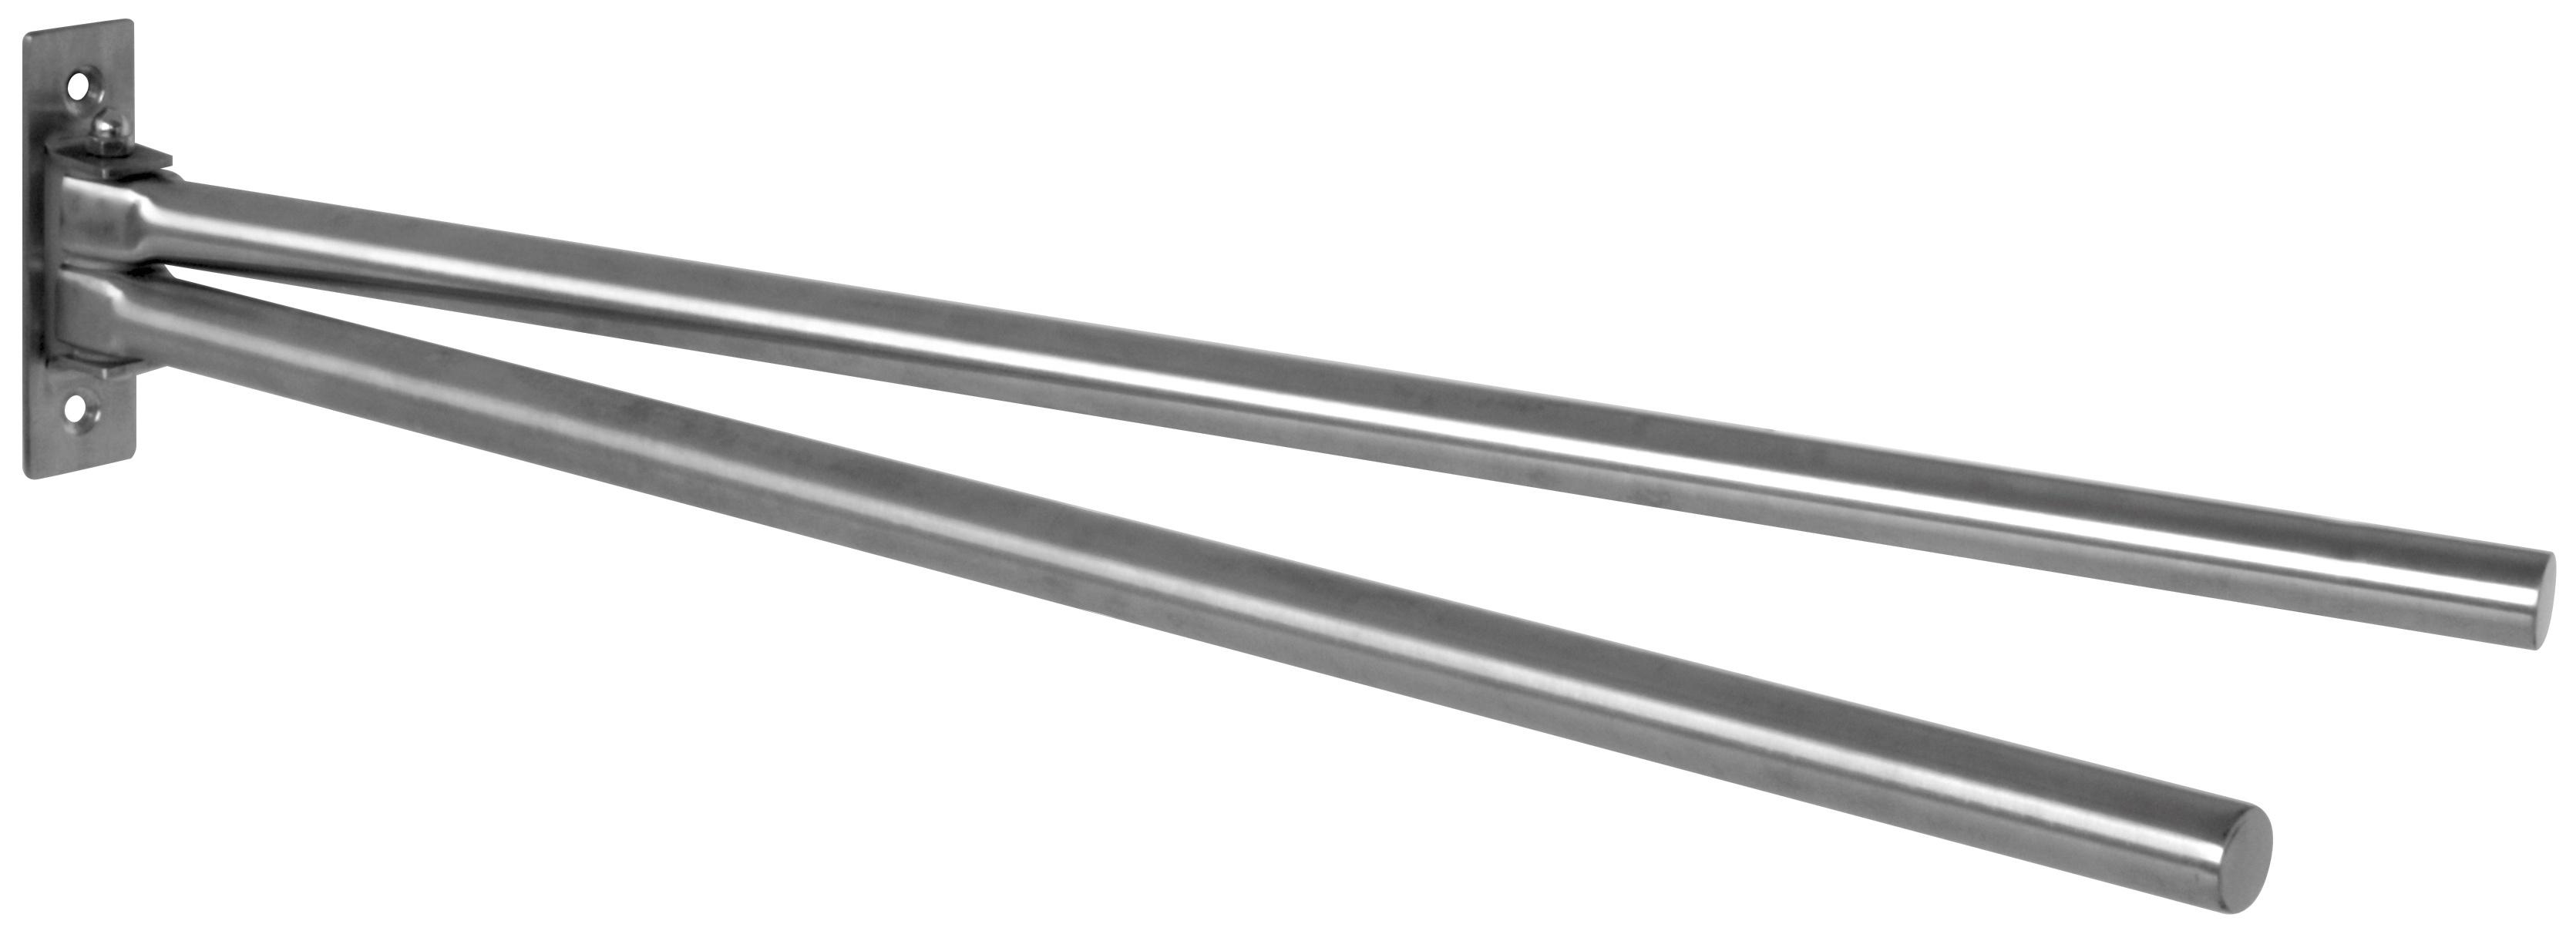 Porte serviettes à 2 barres mobiles finition Inox Brossé (Inox)